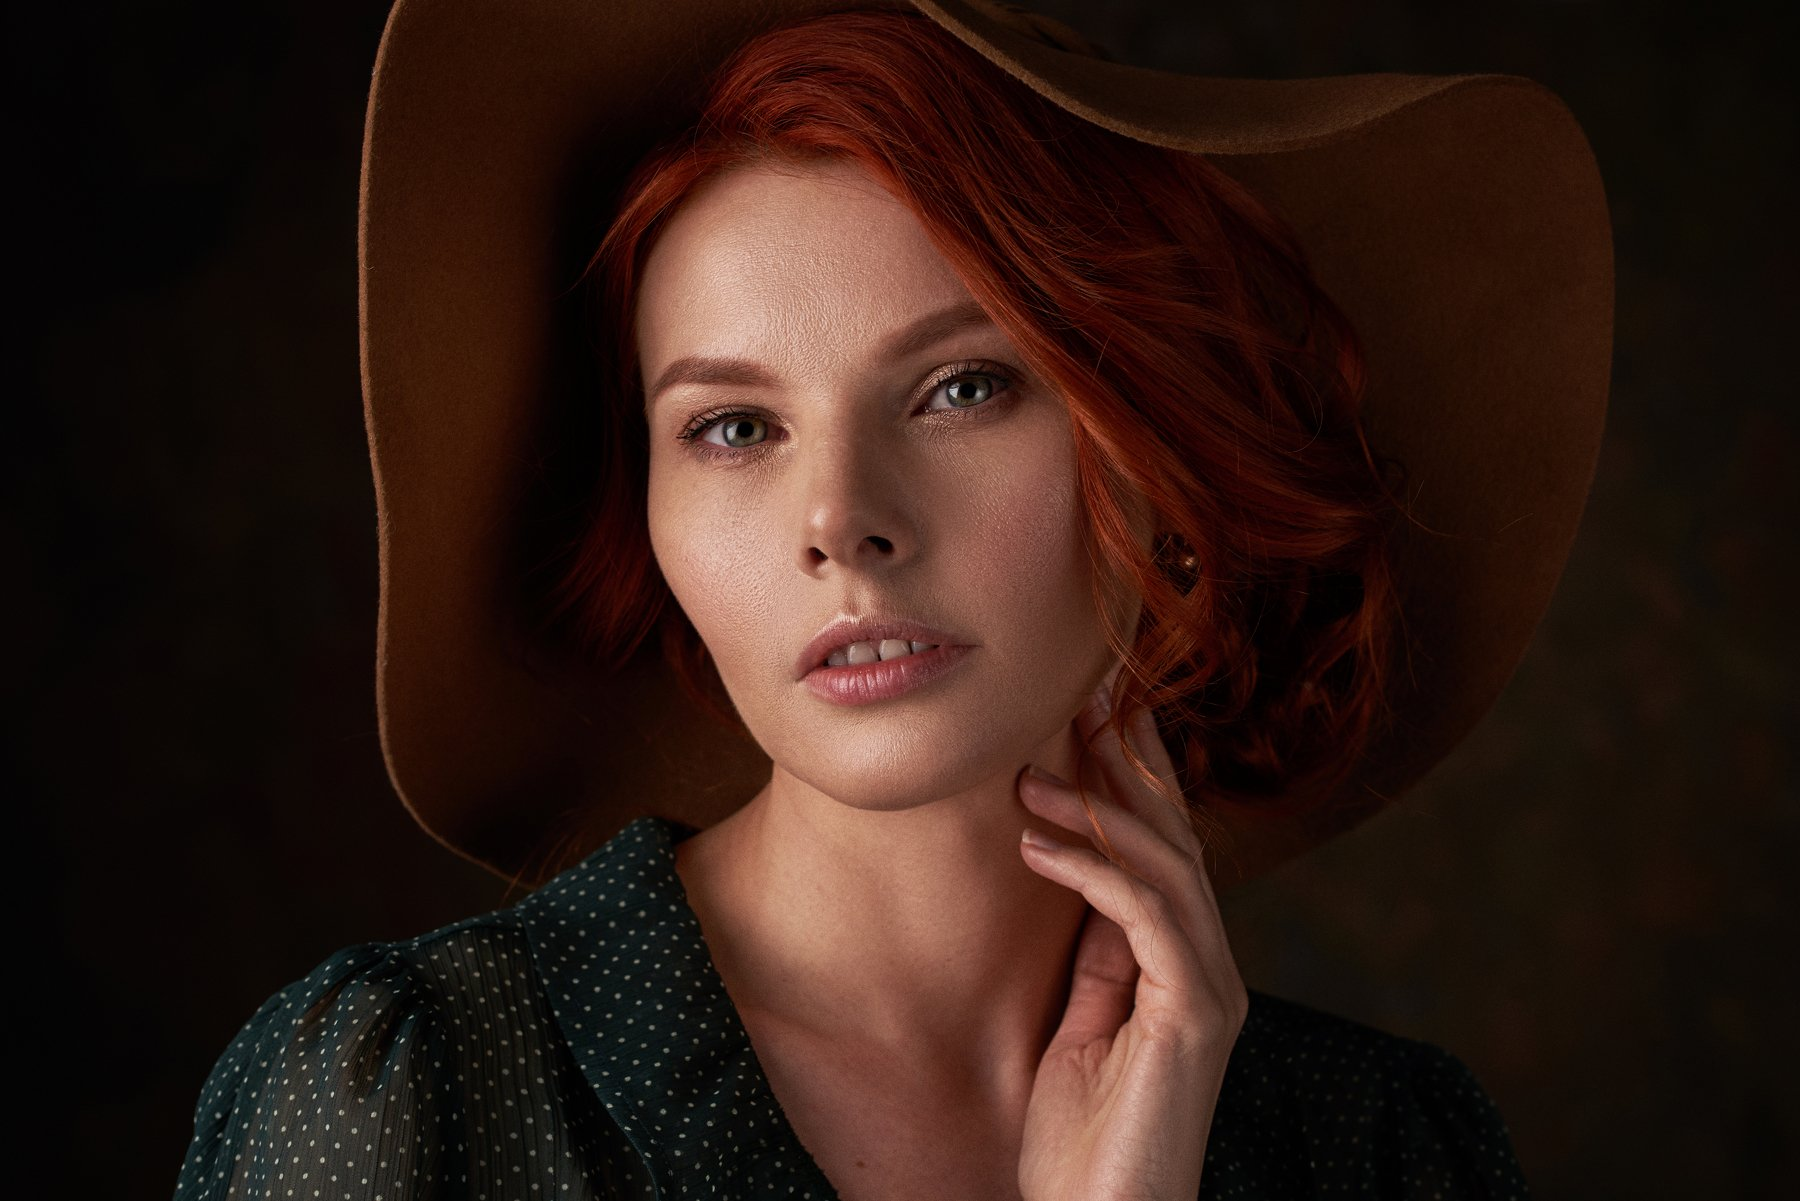 pyzhikphoto, портрет, классика, классический портрет, портрет девушки, женский портрет, portrait, classic, art, красавица, Пыжик Максим